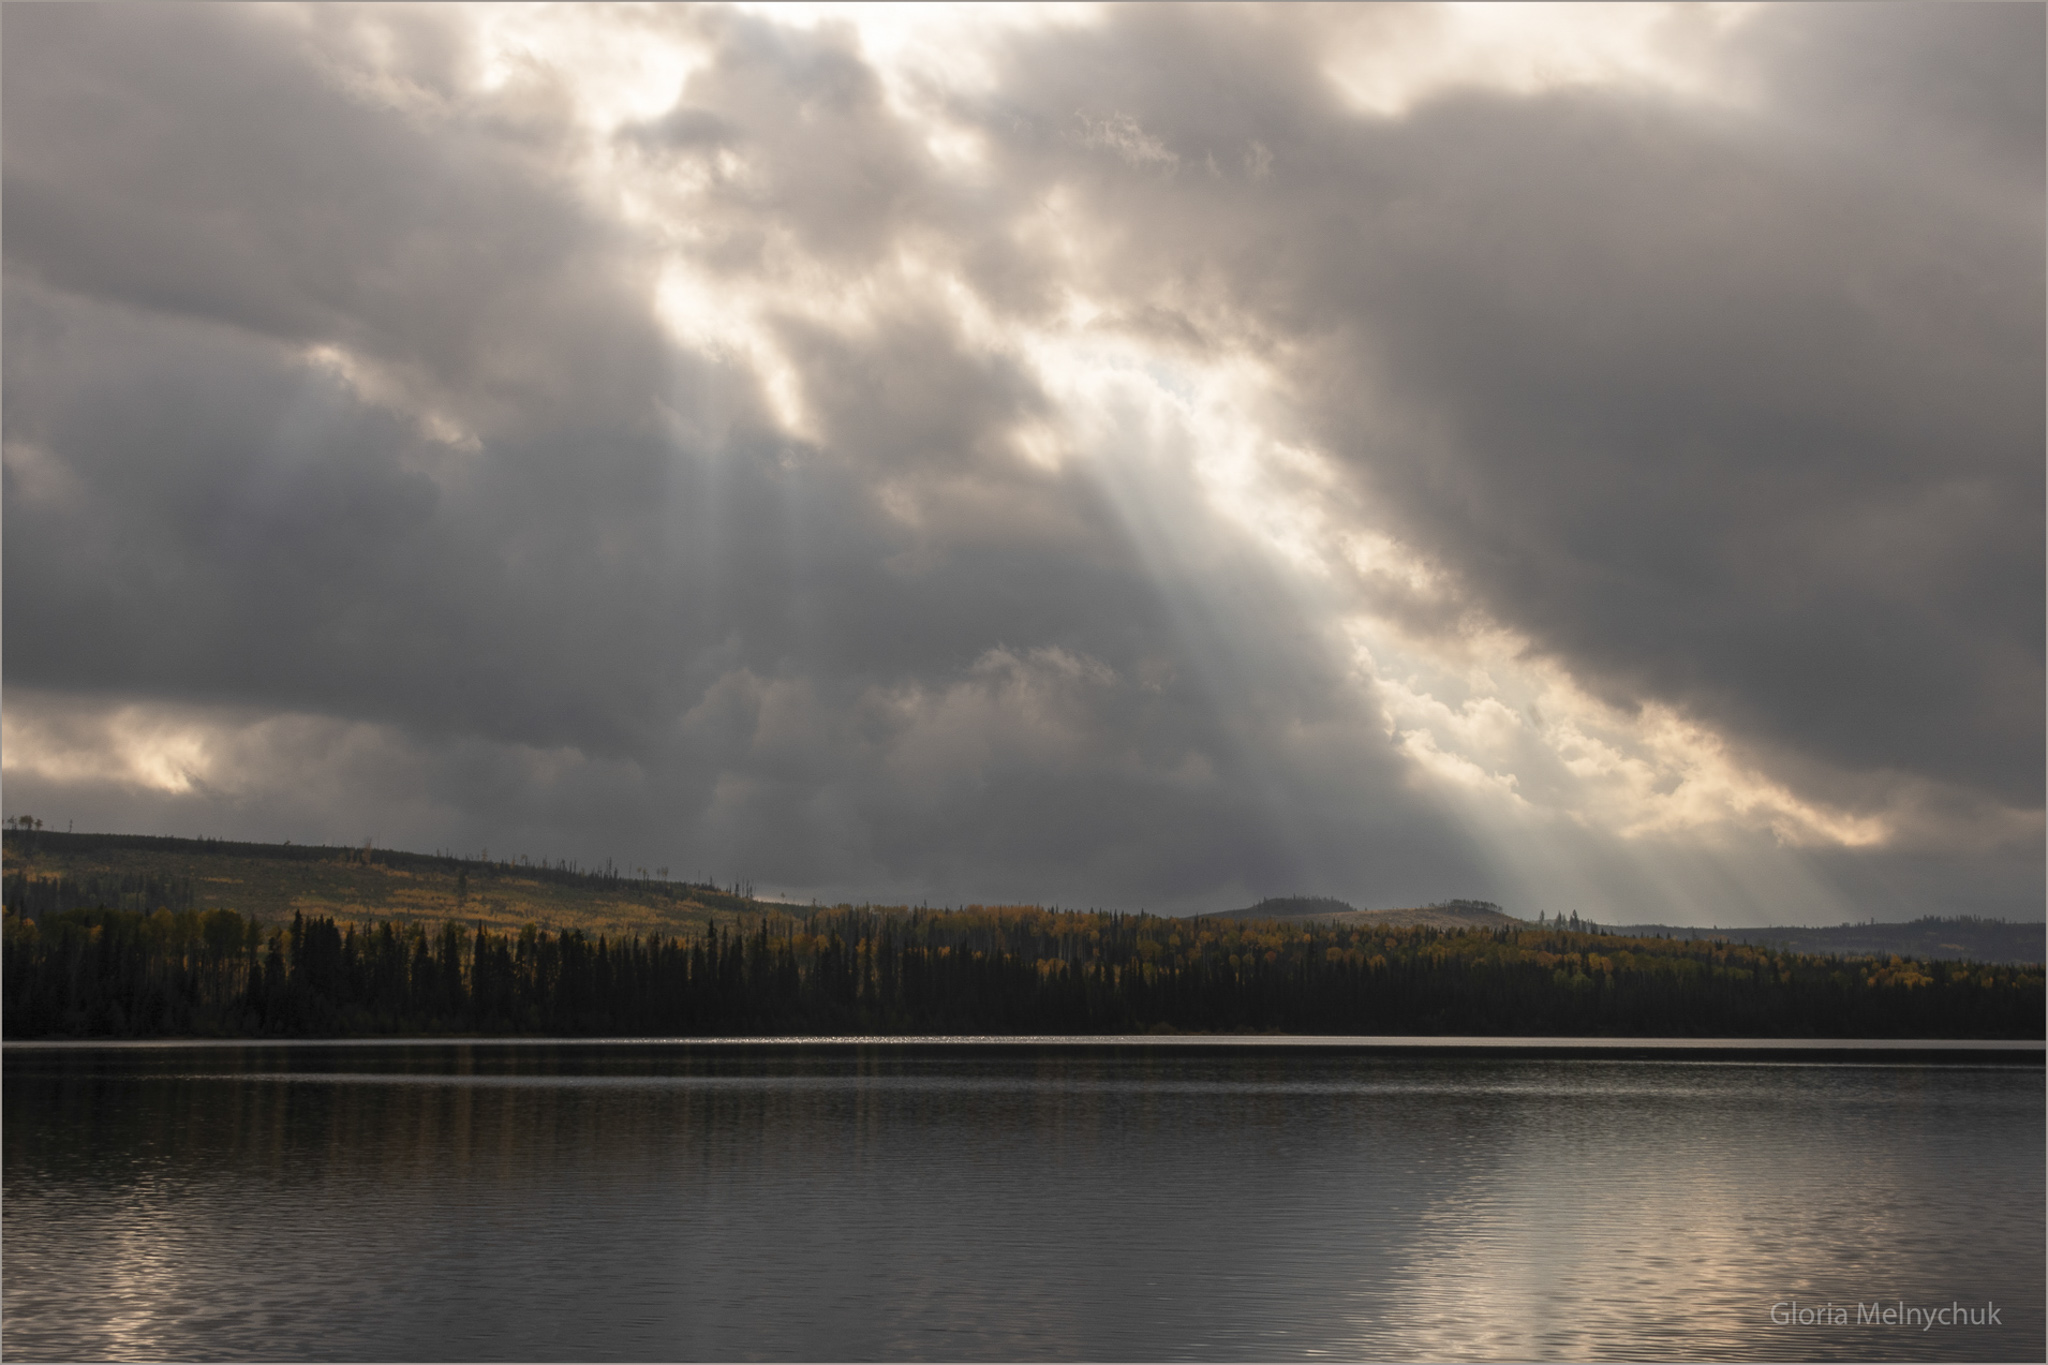 Sun Wants to Shine - Gloria Melnychuk